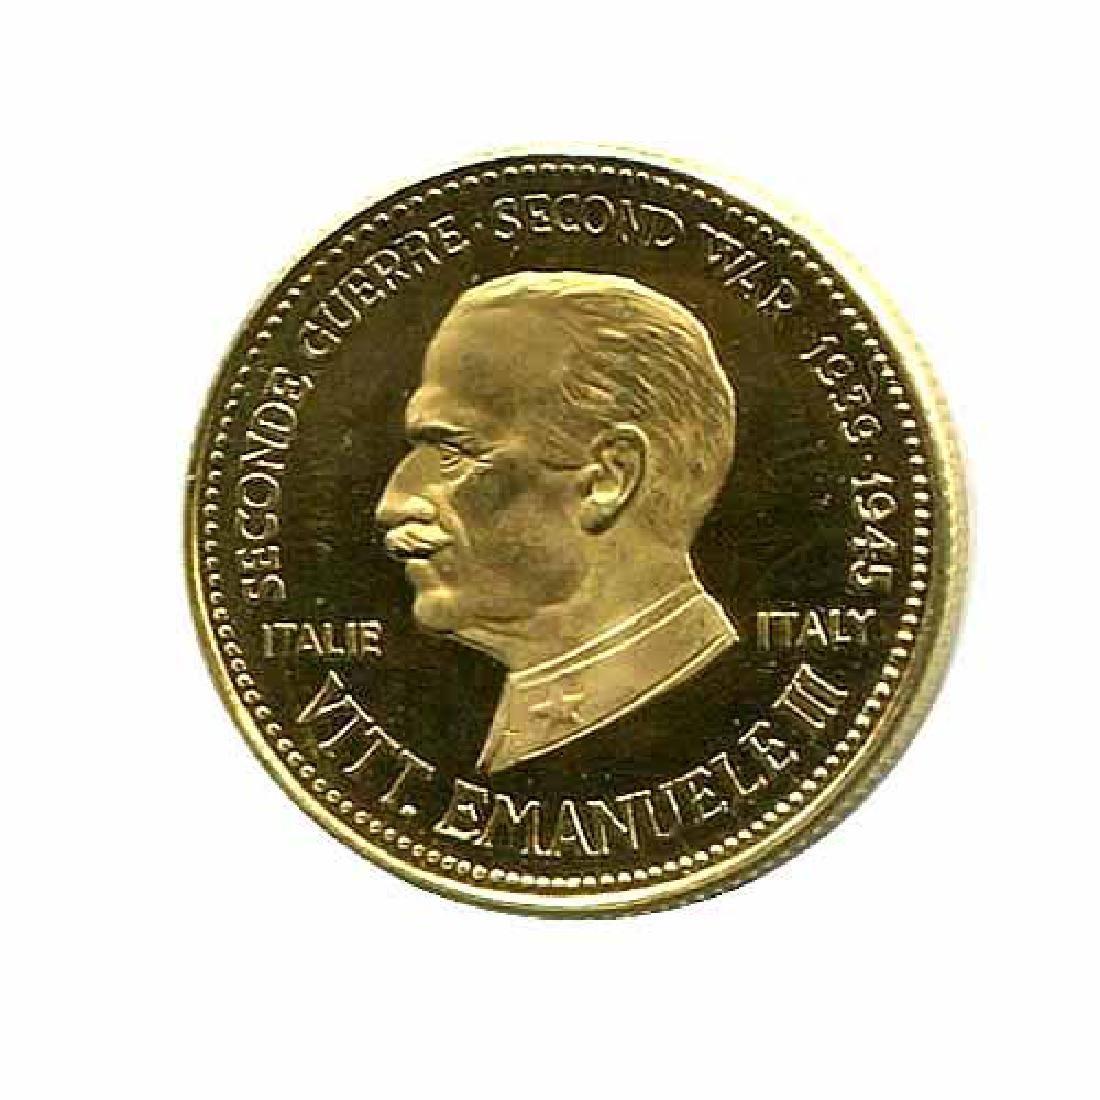 WWII Commemorative Proof Gold Medal 7g. 1958 Vitorrio E